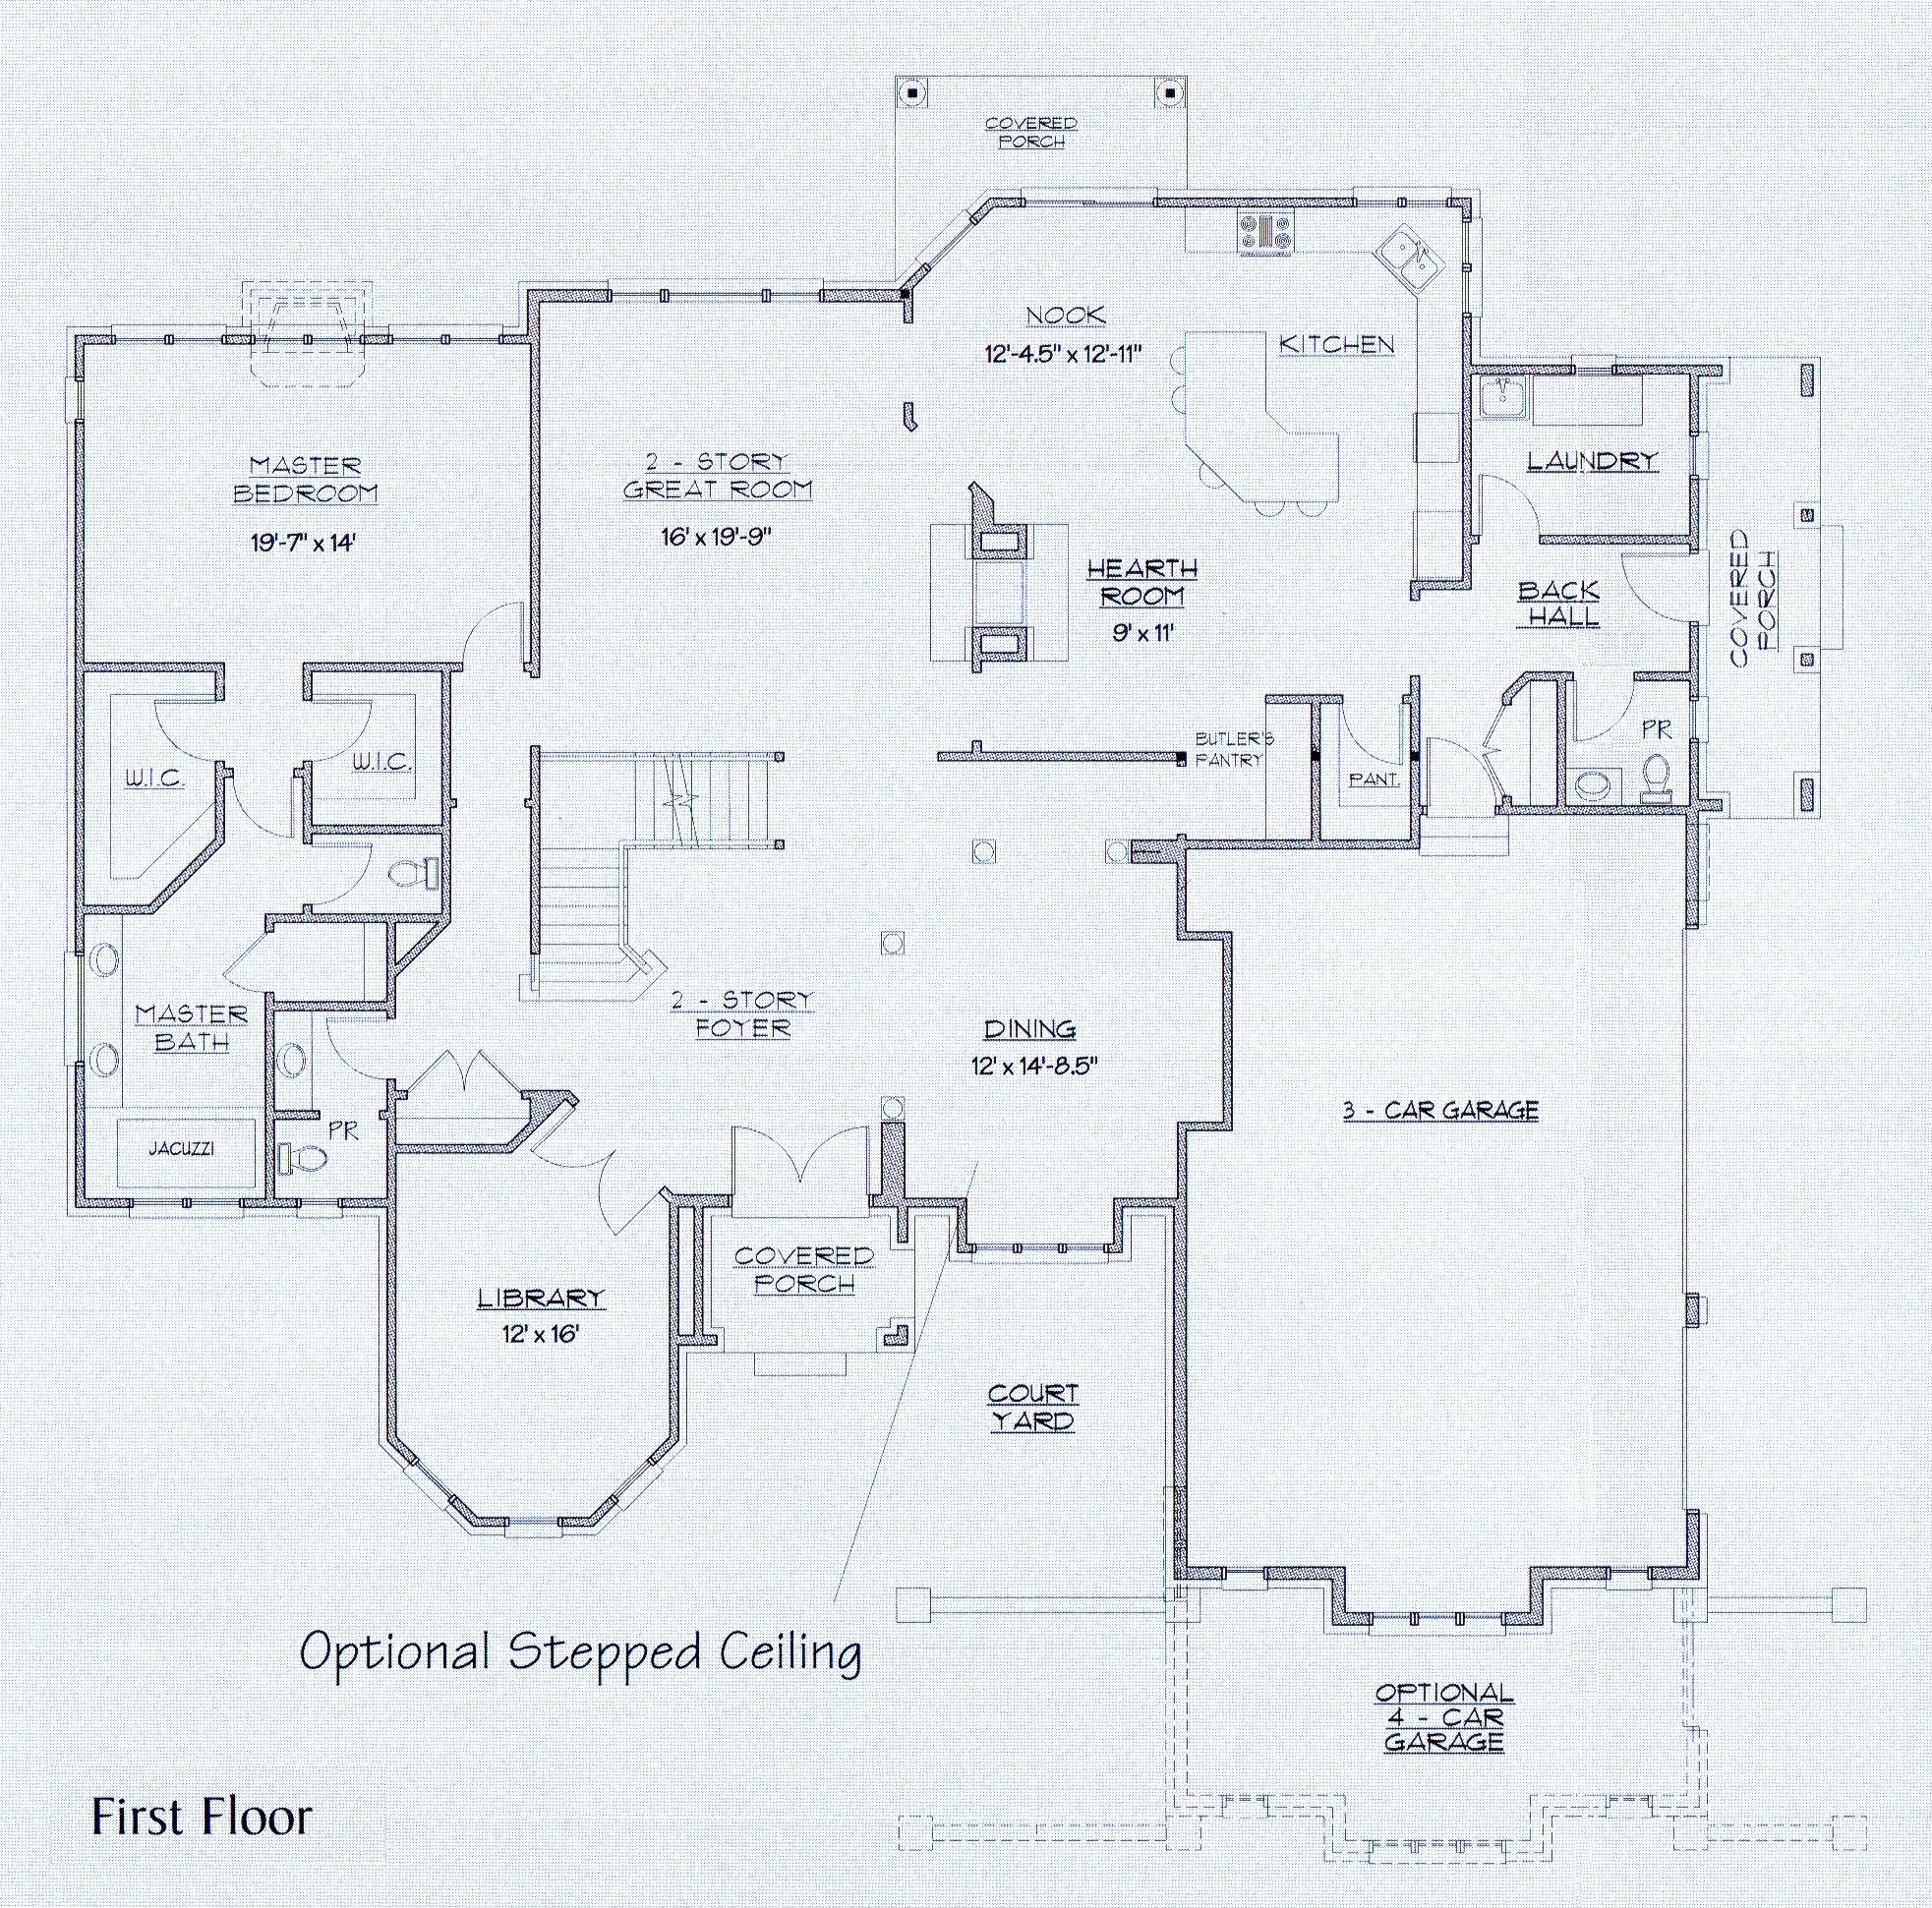 Catalpa First Floor